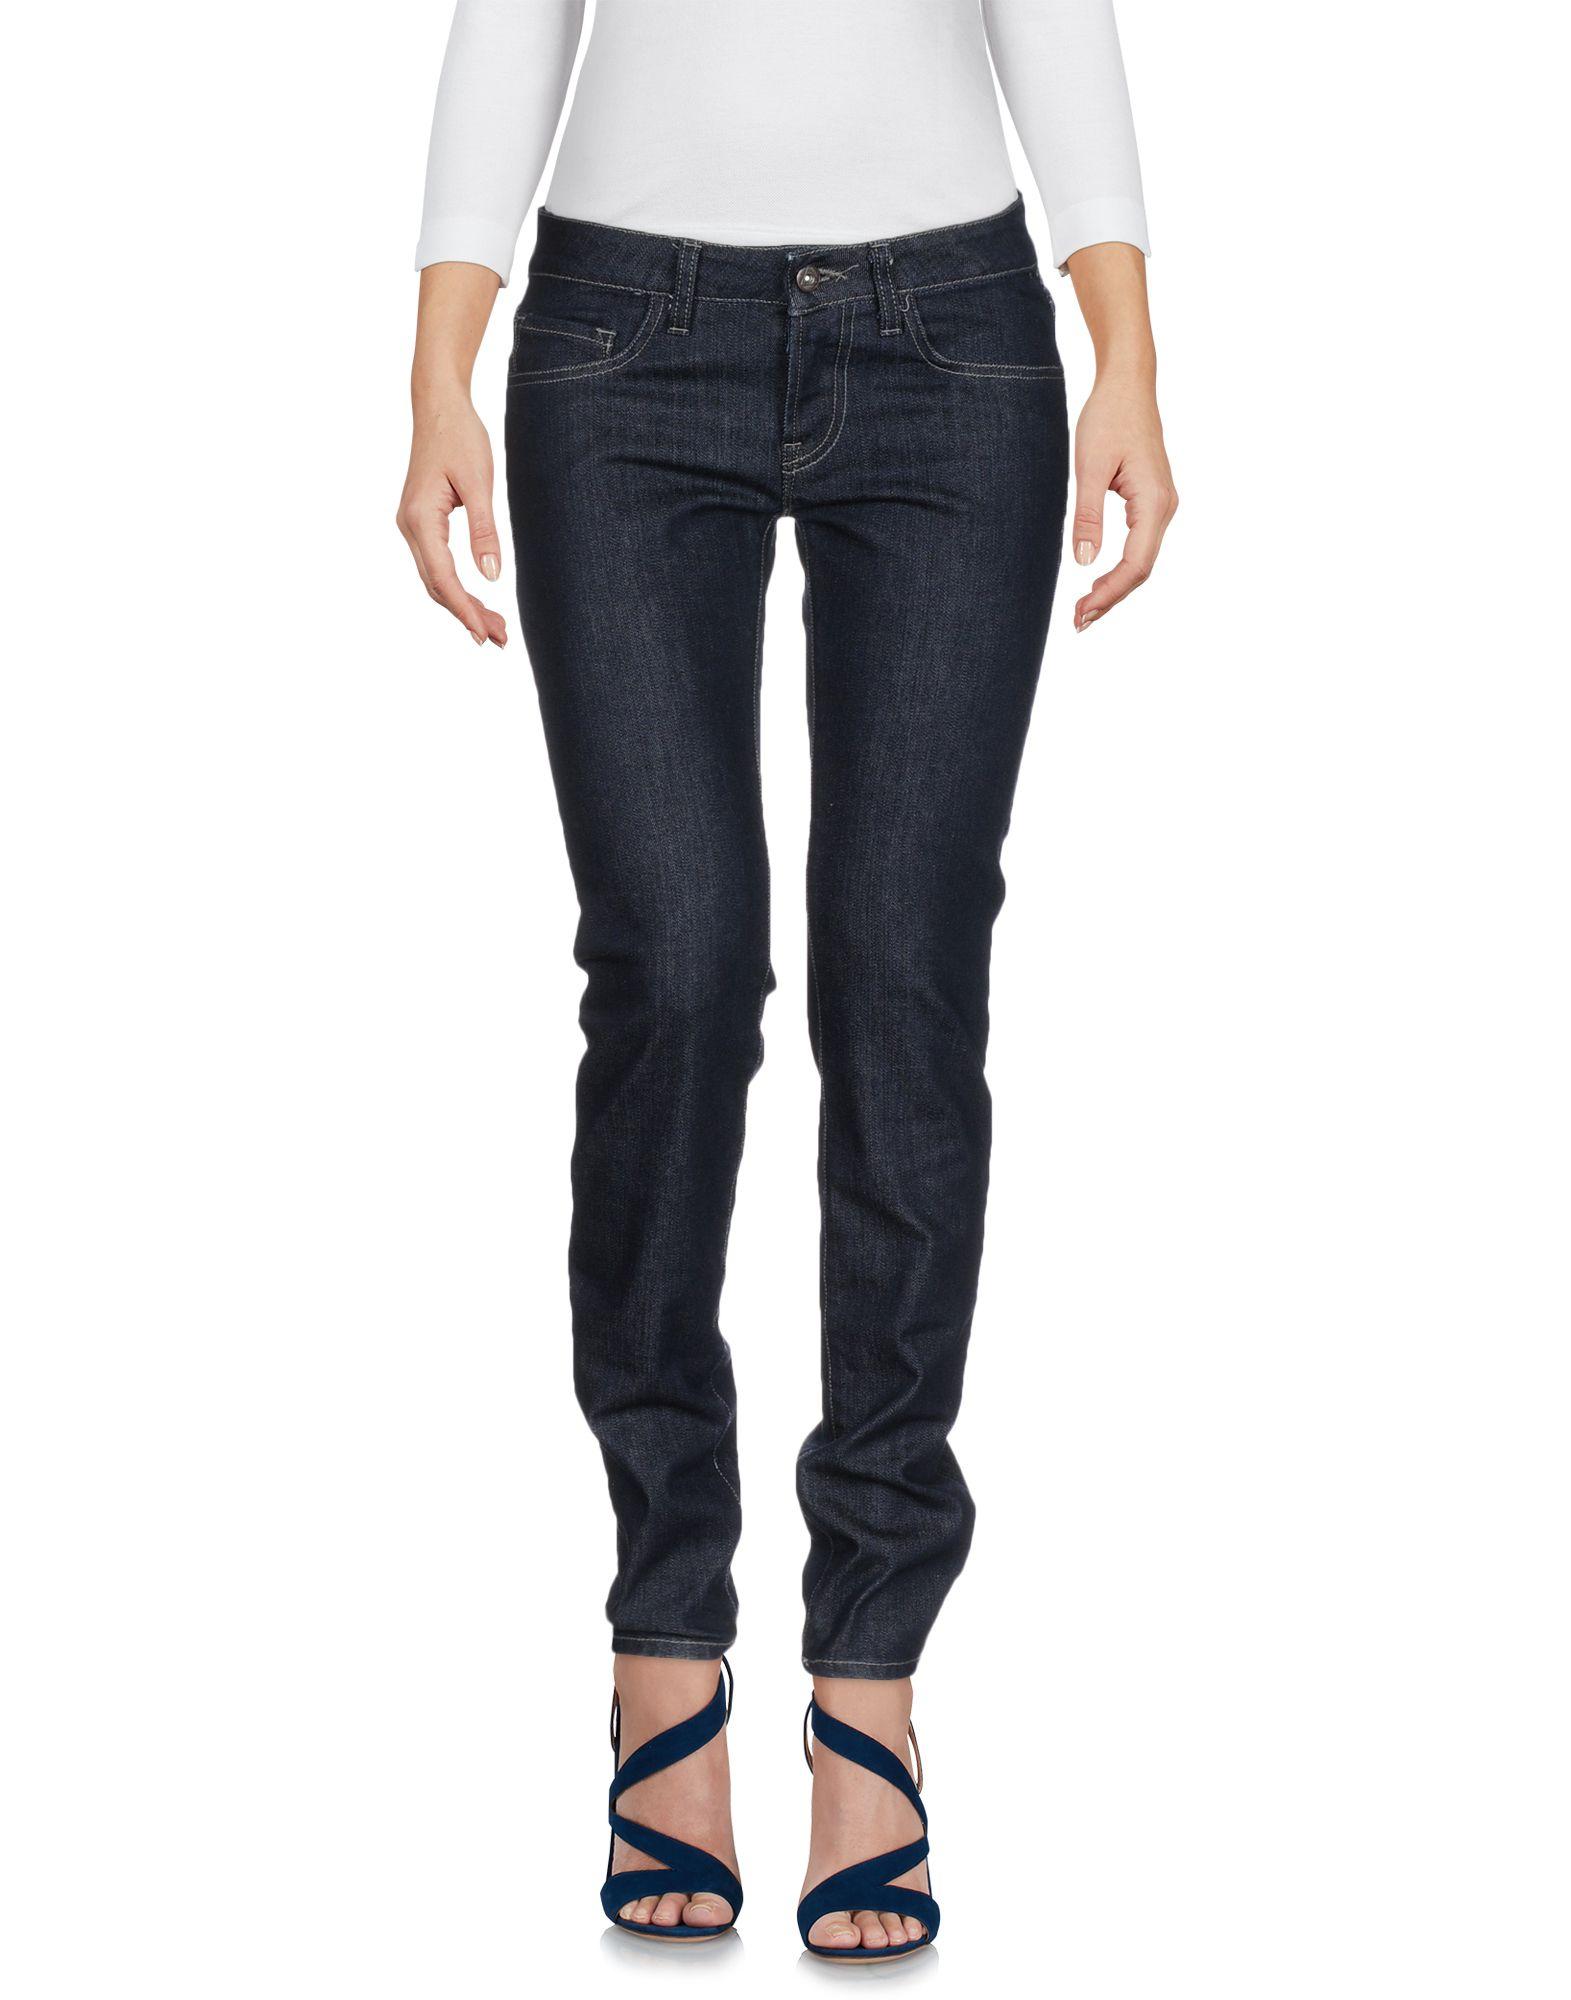 Pantaloni Jeans Roÿ Roger's Donna - Acquista online su GgqH6